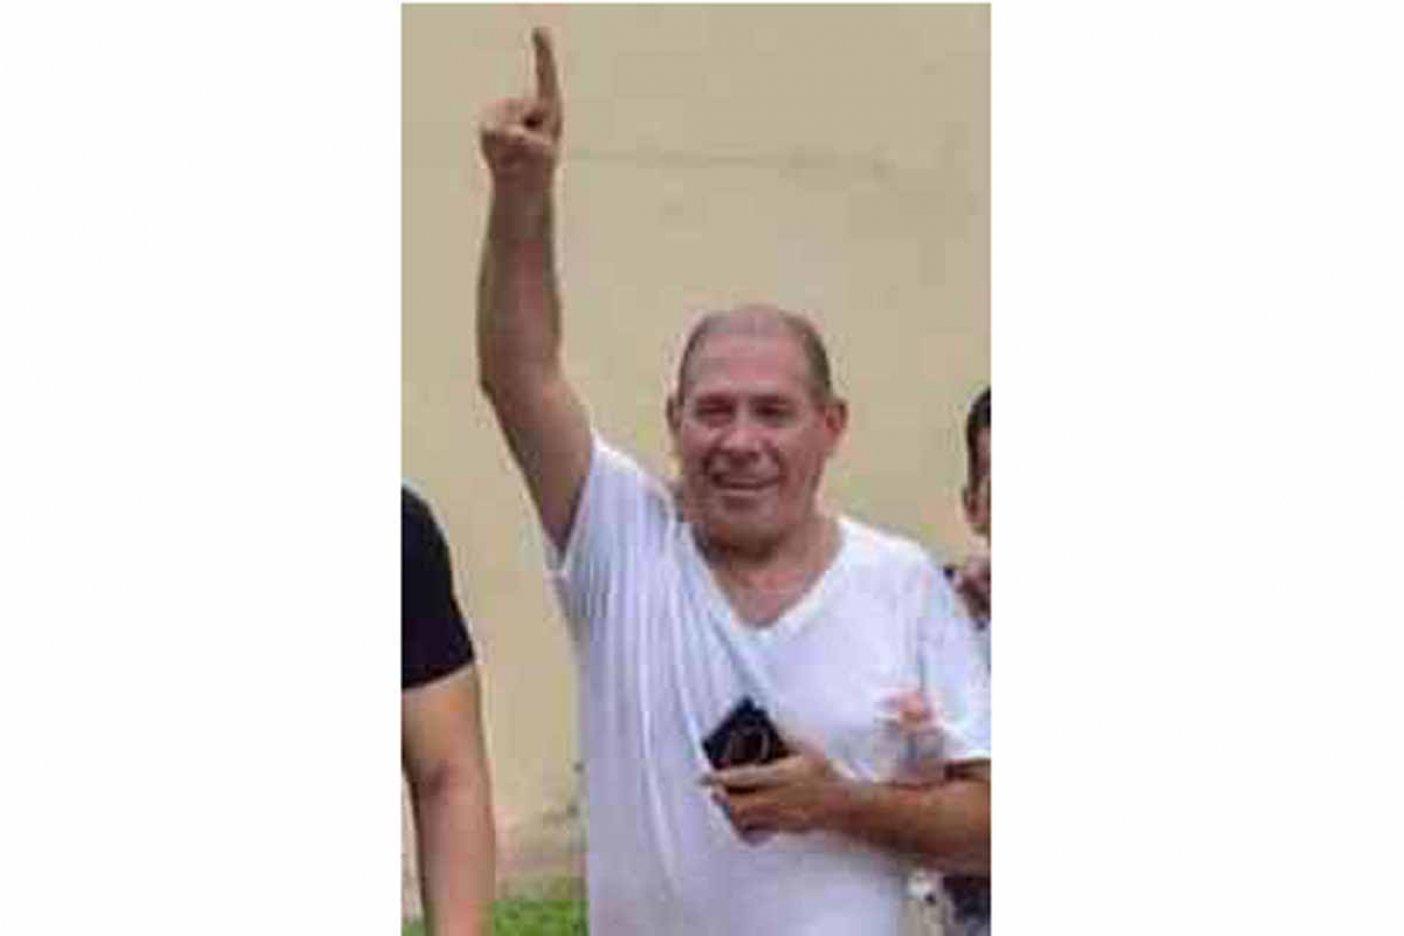 Asesinan a hermano de Julio César Chávez, en Culiacán